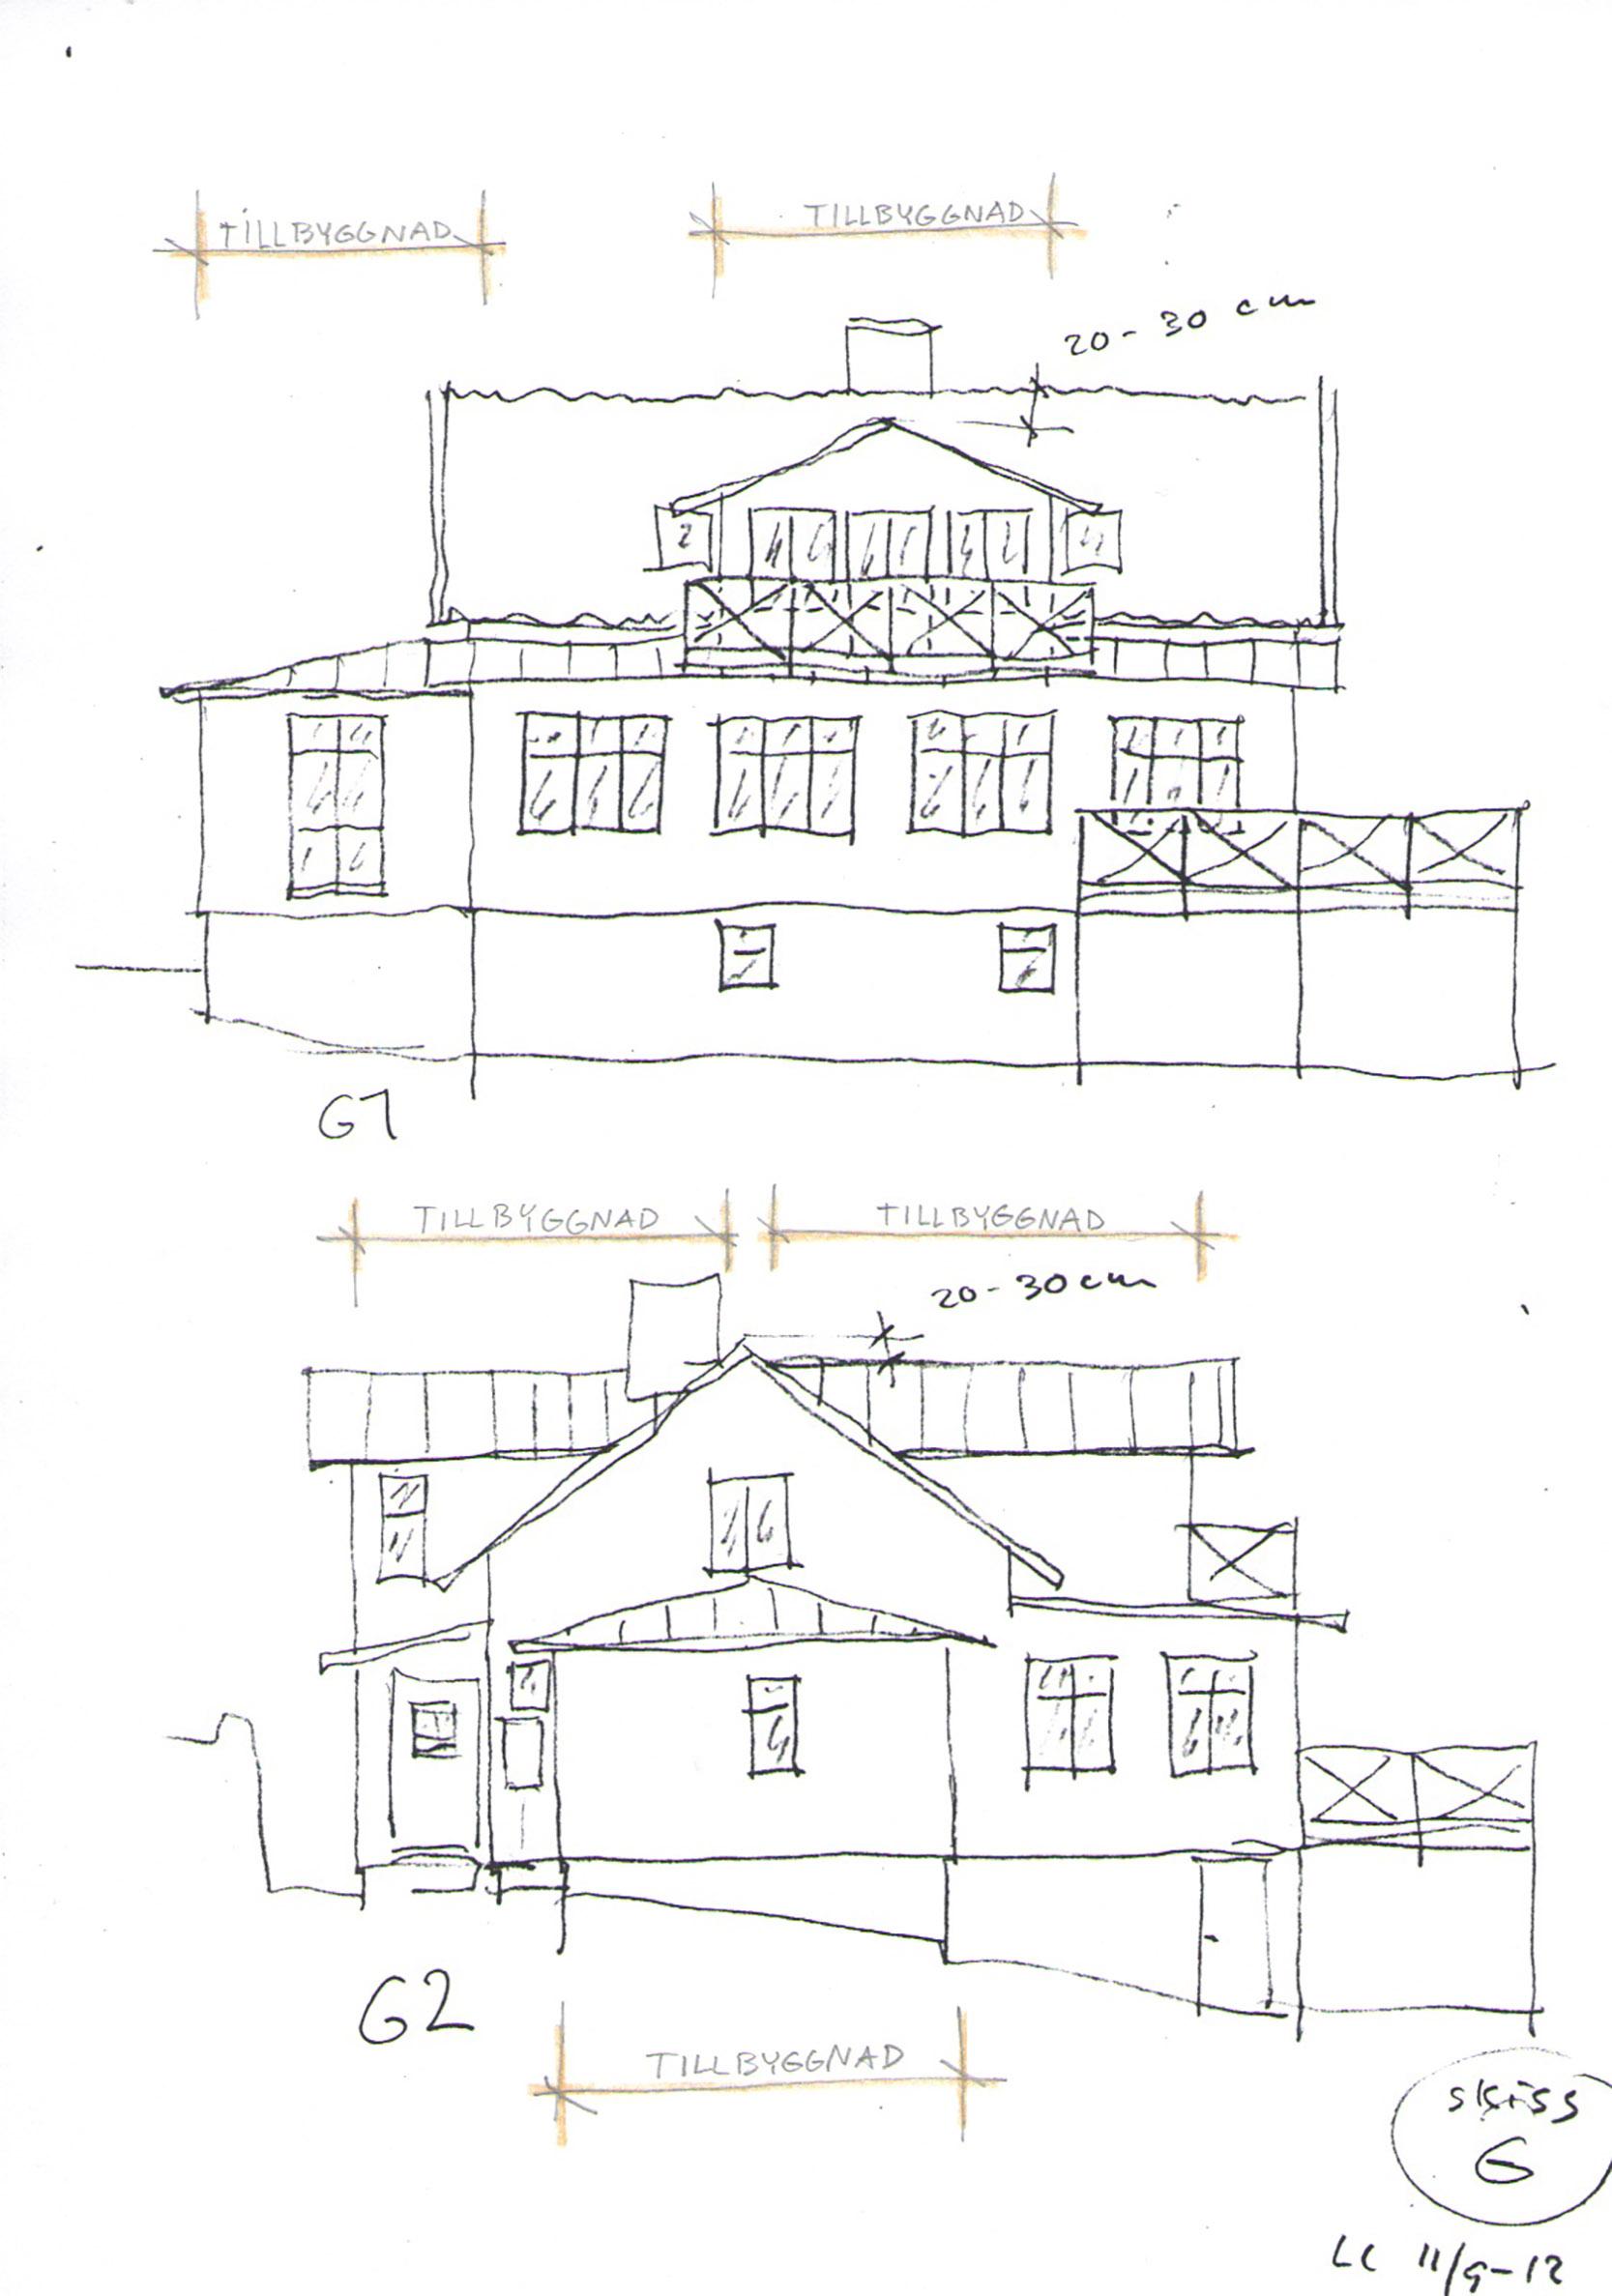 Leif_Carlsson_arkitektSkiss G